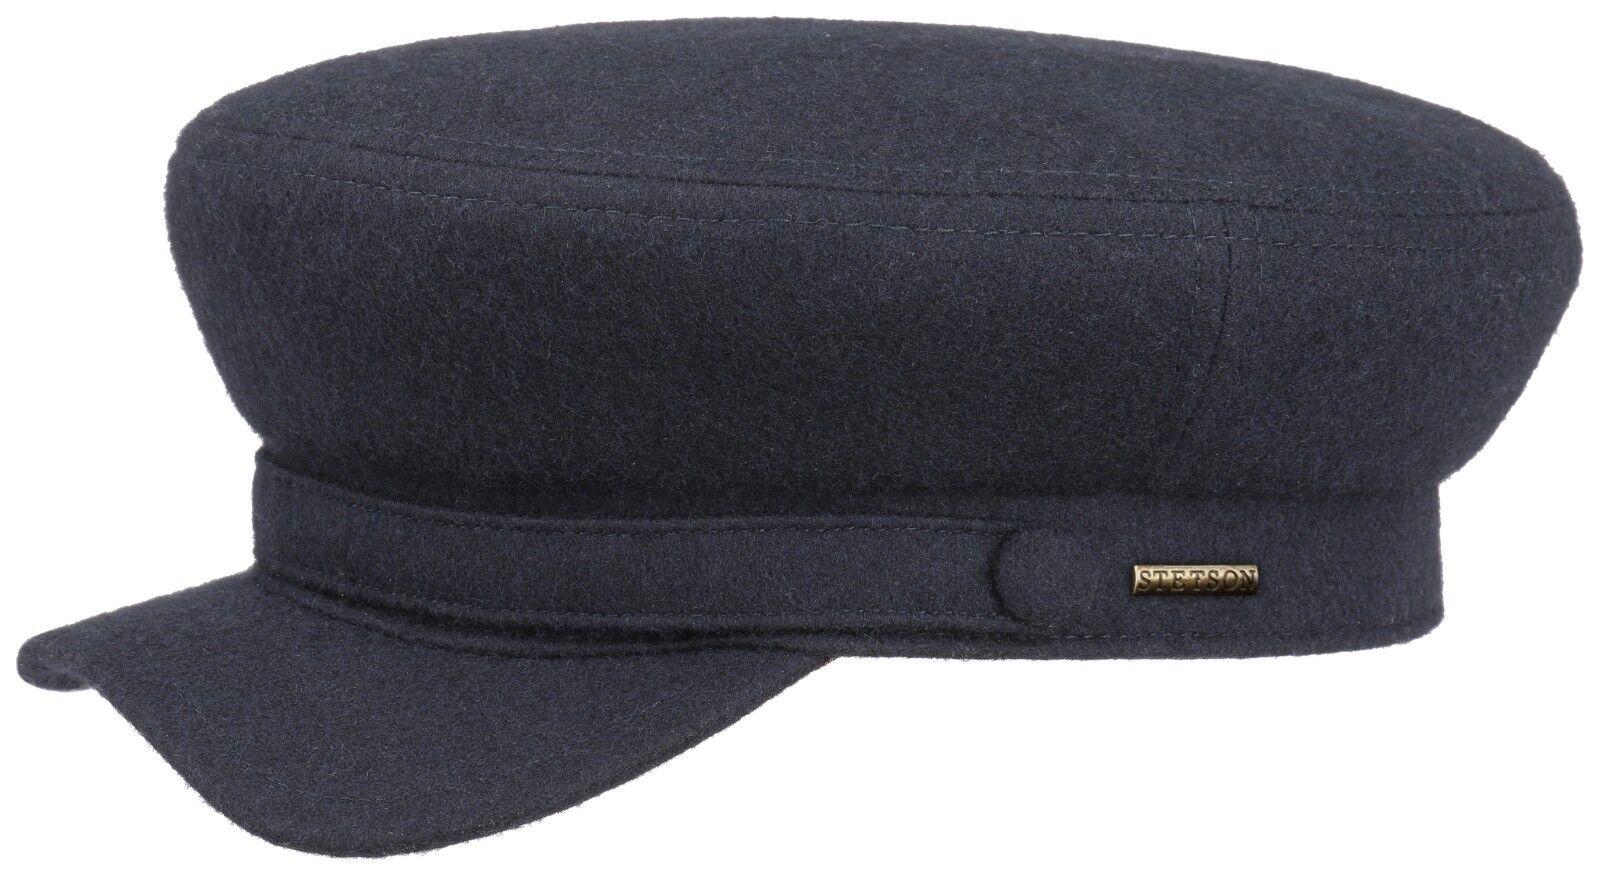 Stetson Elbsegler  Schurwolle Kapitänsmütze Seglermütze  Marine Fischer Mütze Mütze Mütze    Moderne Technologie  59100c